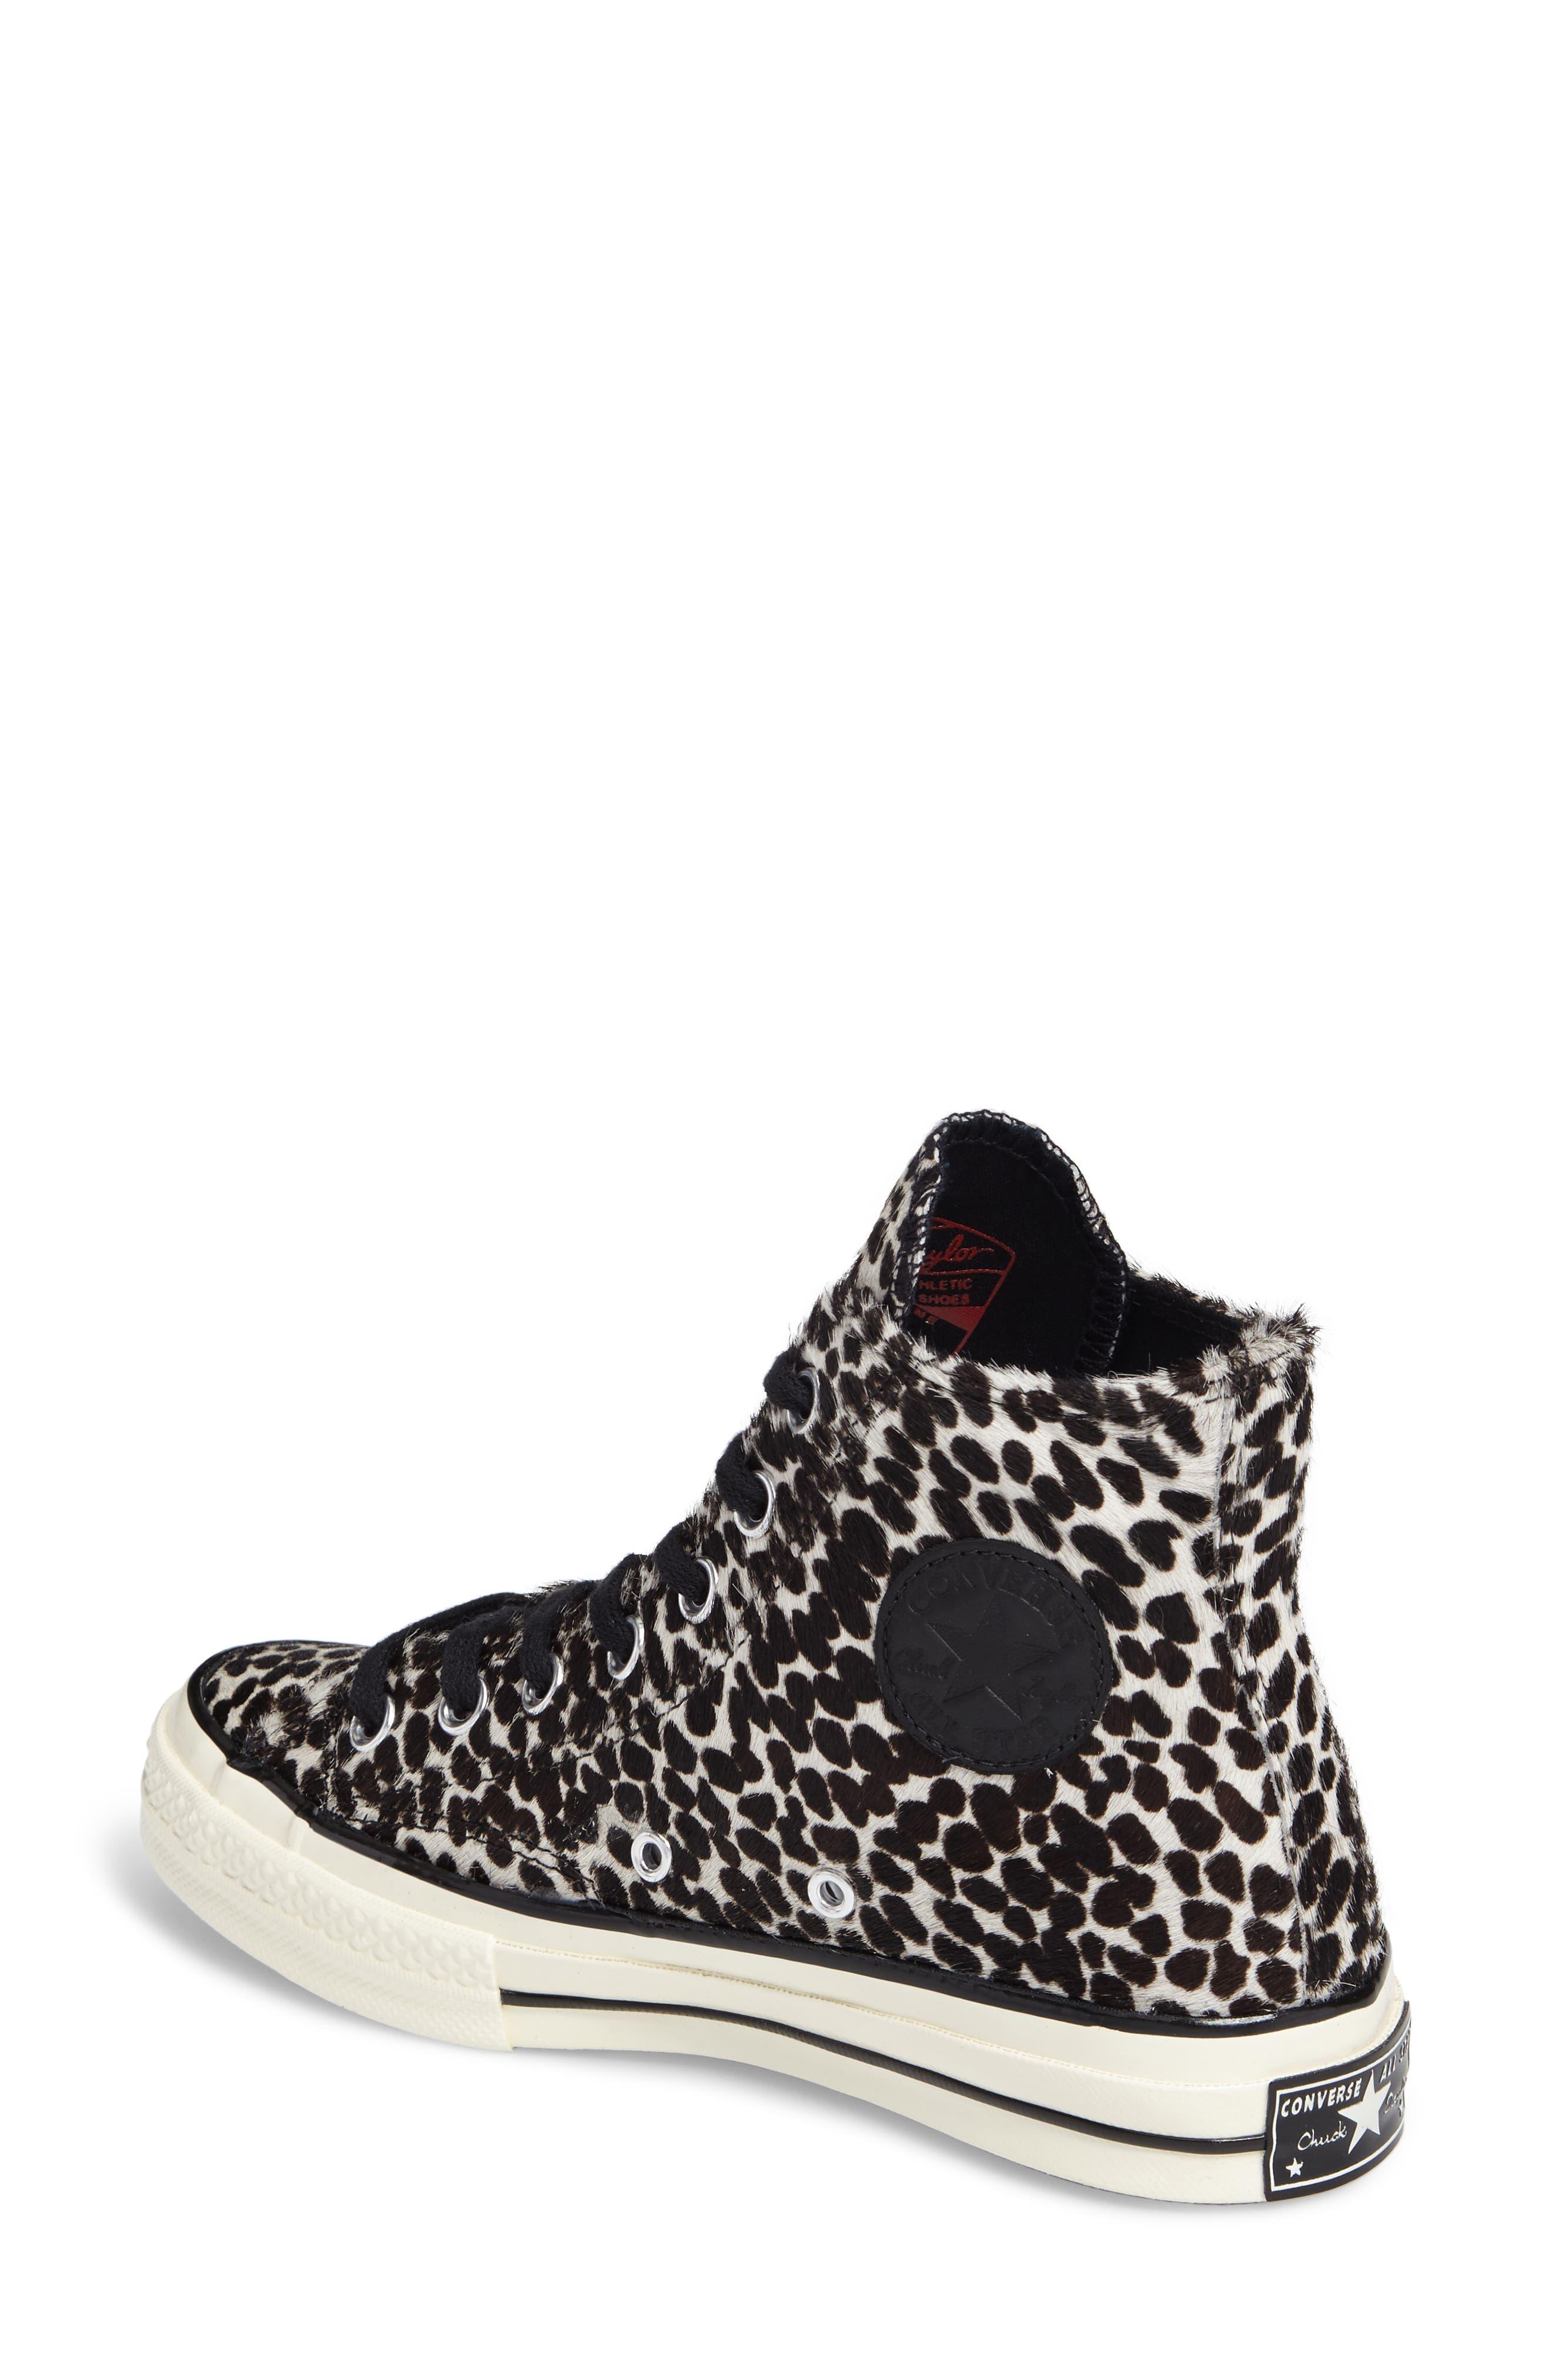 Alternate Image 2  - Converse Chuck Taylor® All Star® 70 Genuine Calf Hair High Top Sneaker (Women)